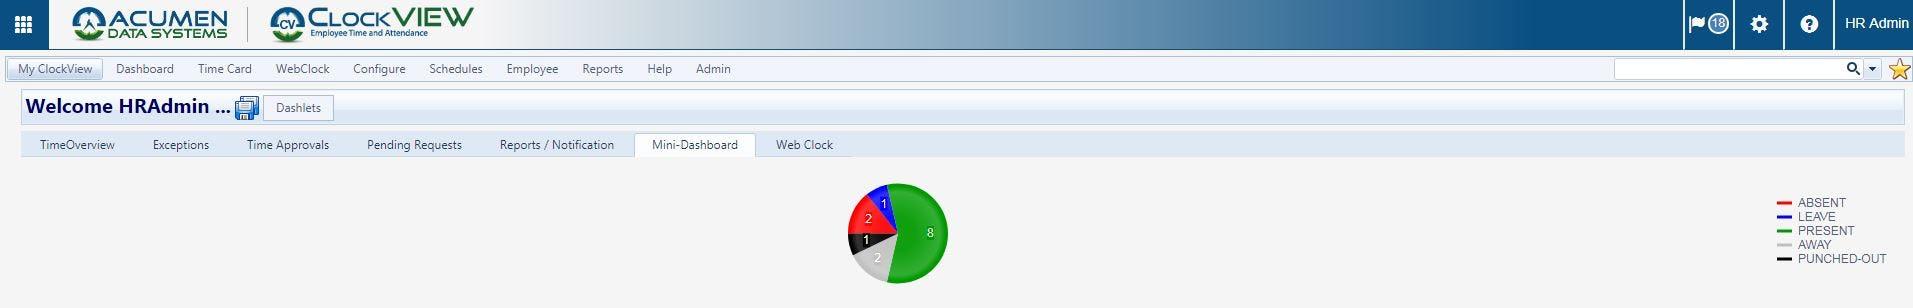 ClockVIEW Software - ClockVIEW mini-dashboard